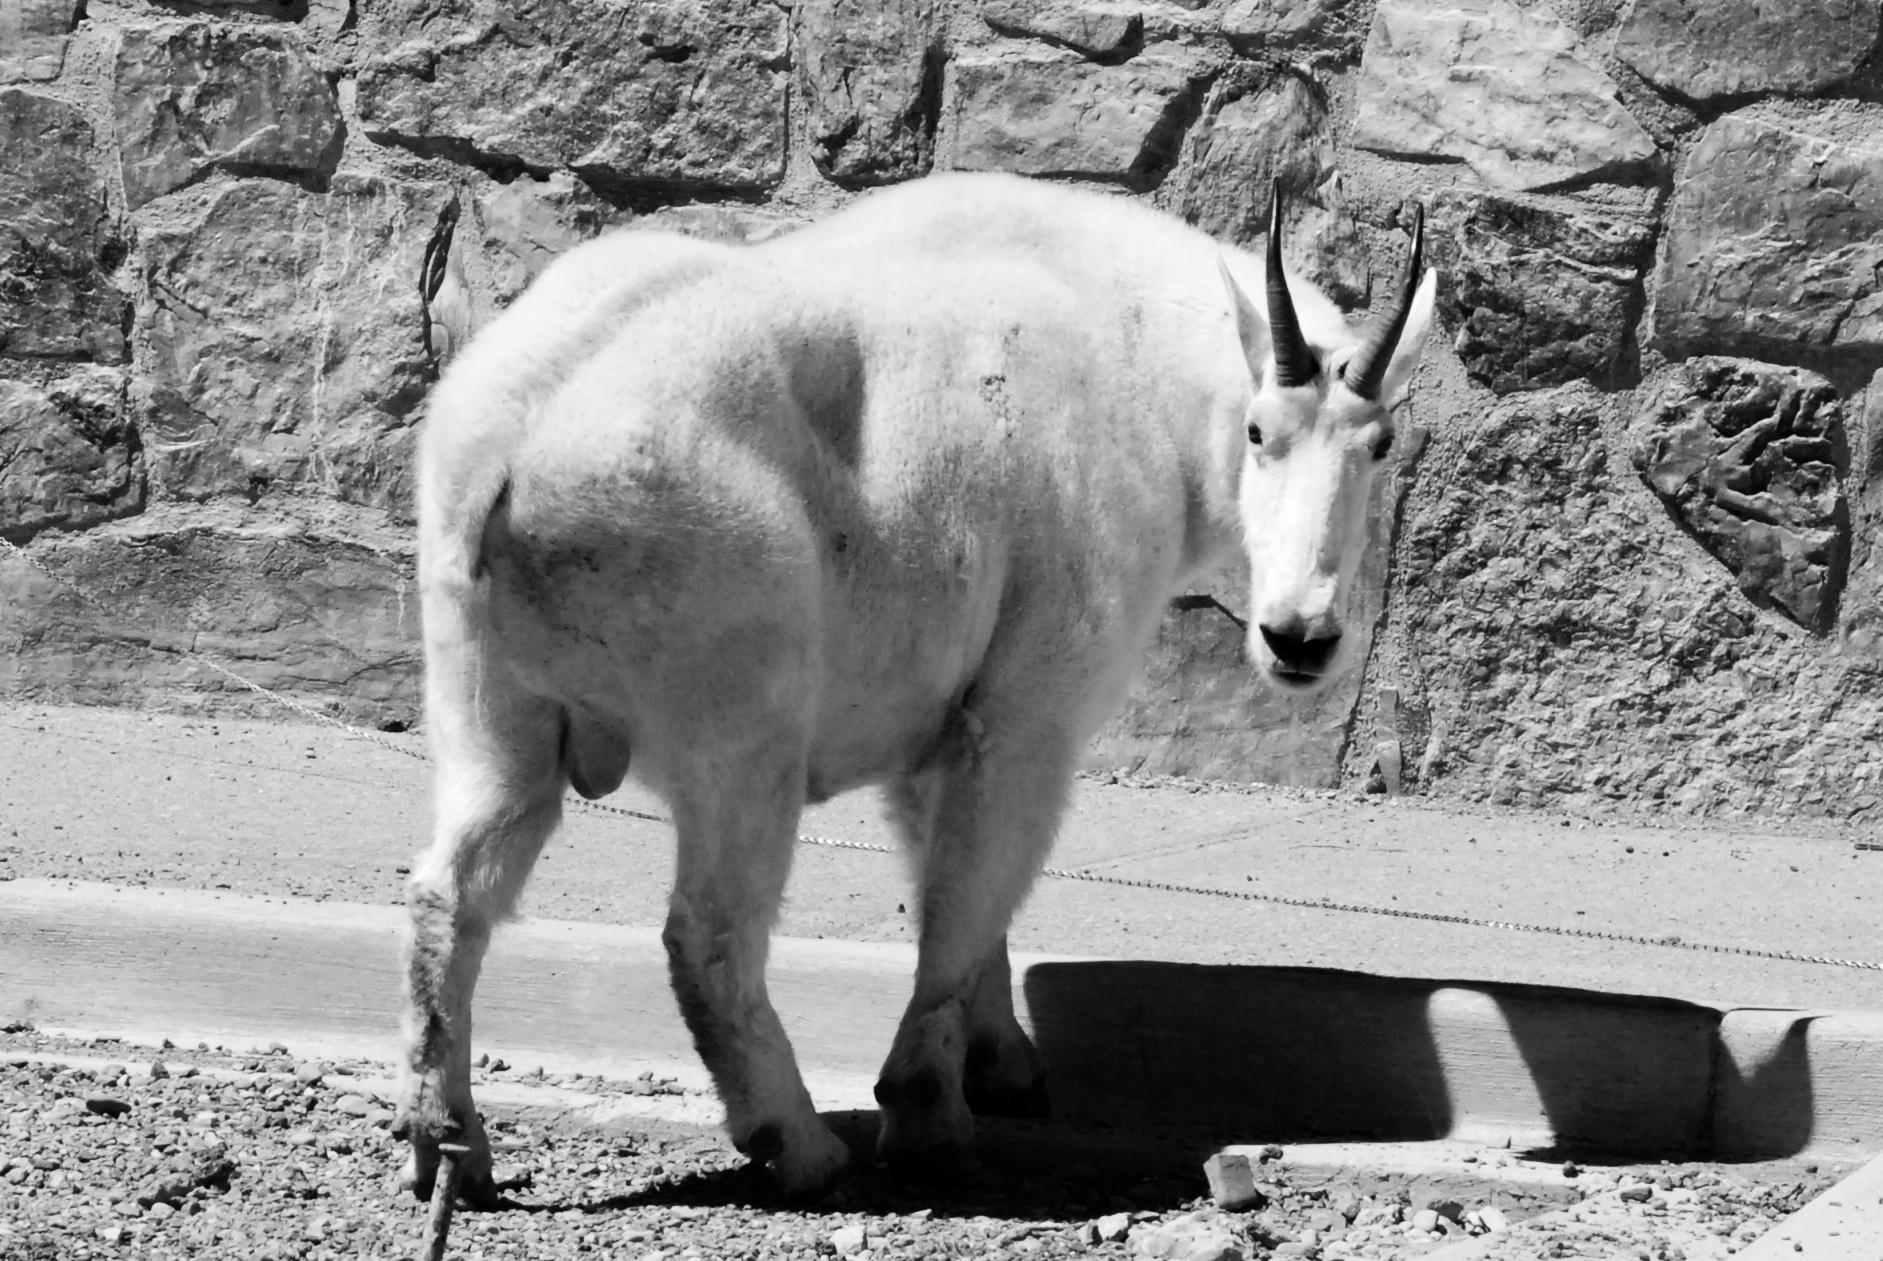 Mountain Goat - Glacier NP